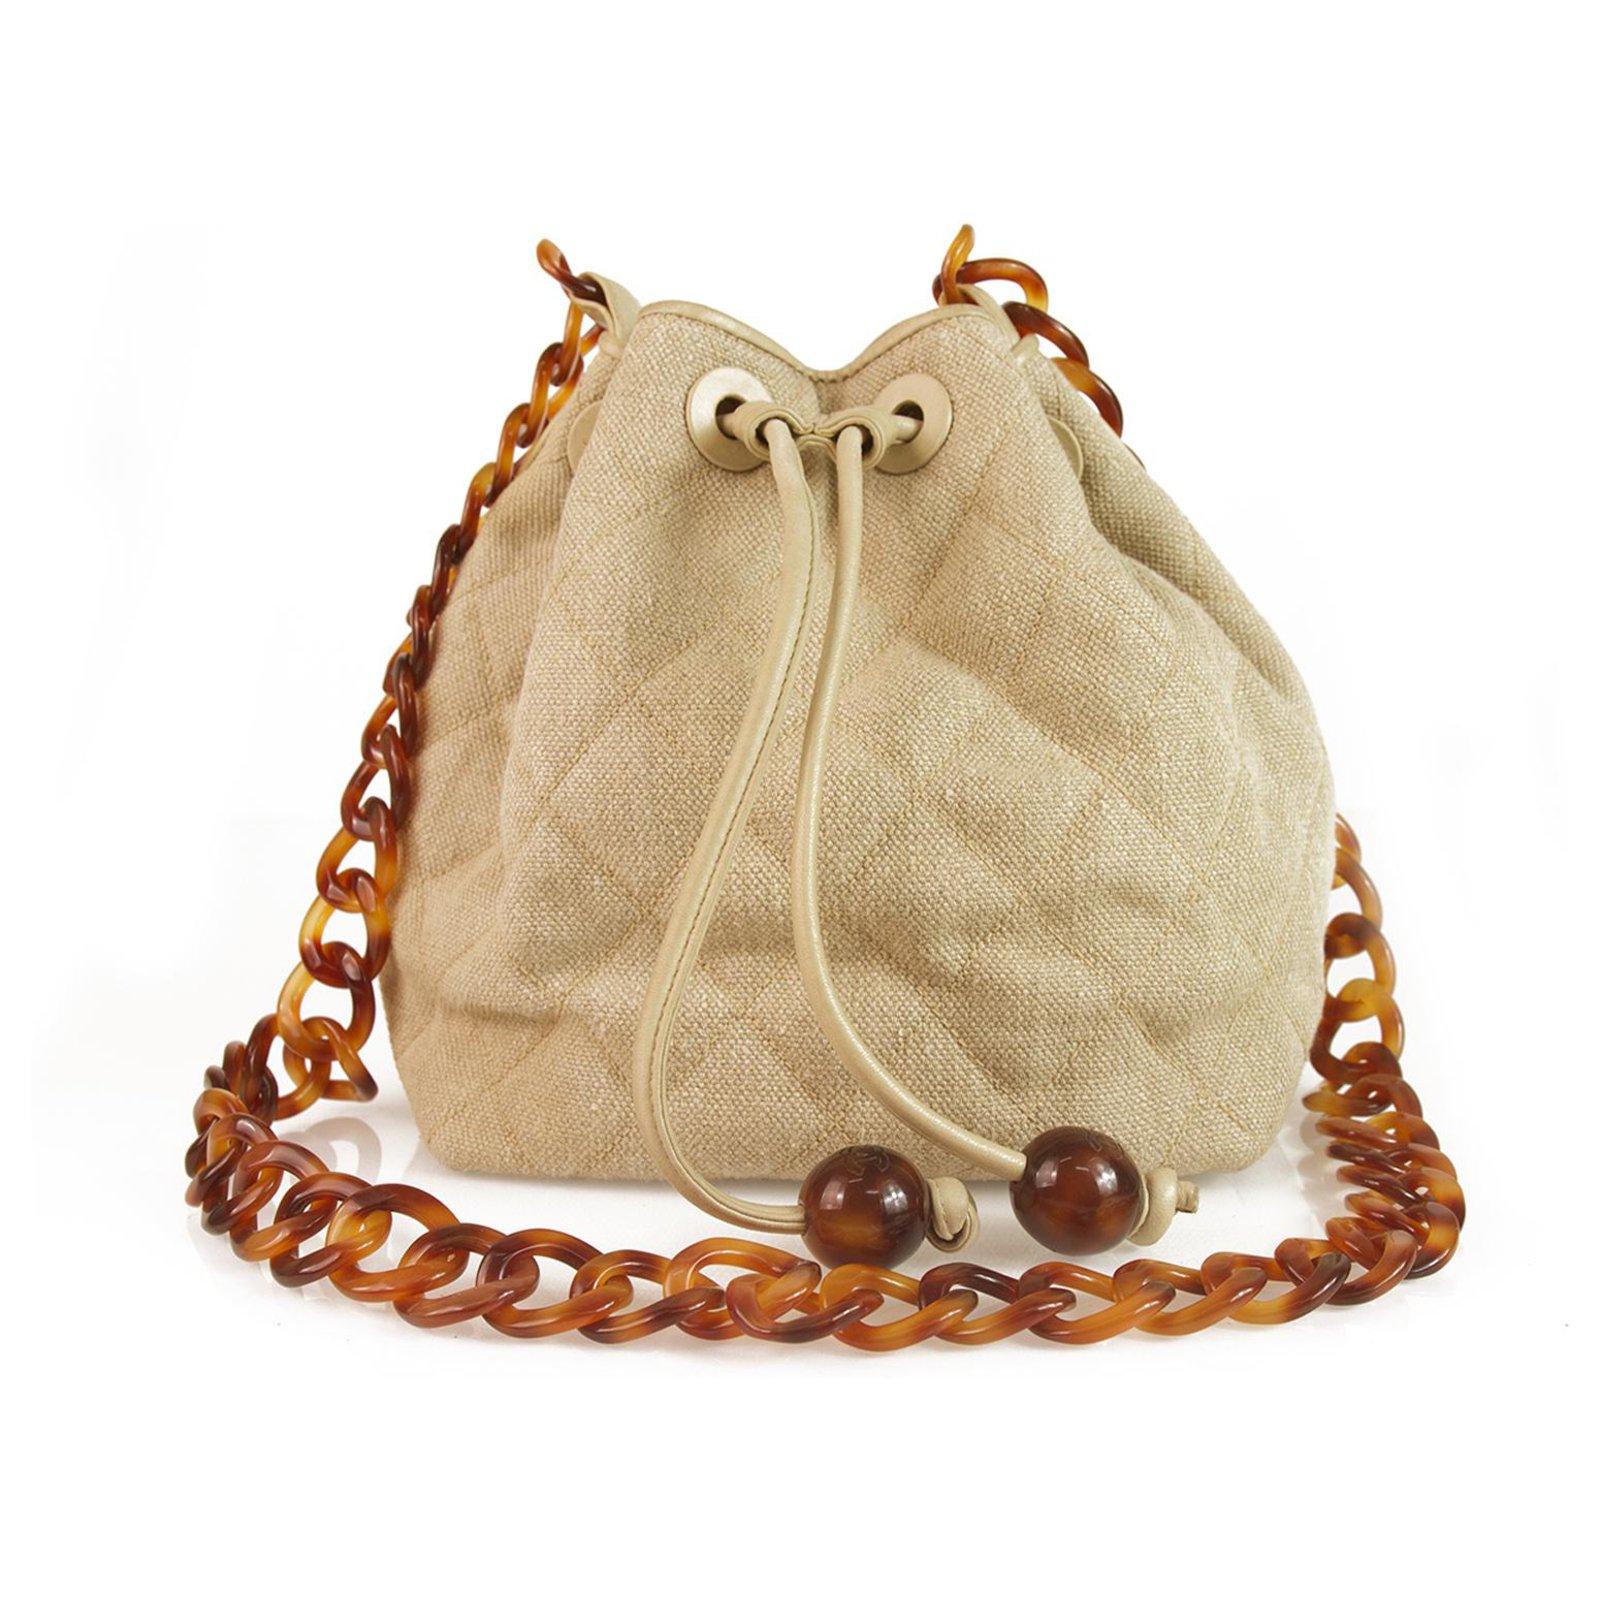 e64b66eece69 Chanel Vintage Beige Linen & Leather Drawstring Crossbody Bag w. Tortoise  chain